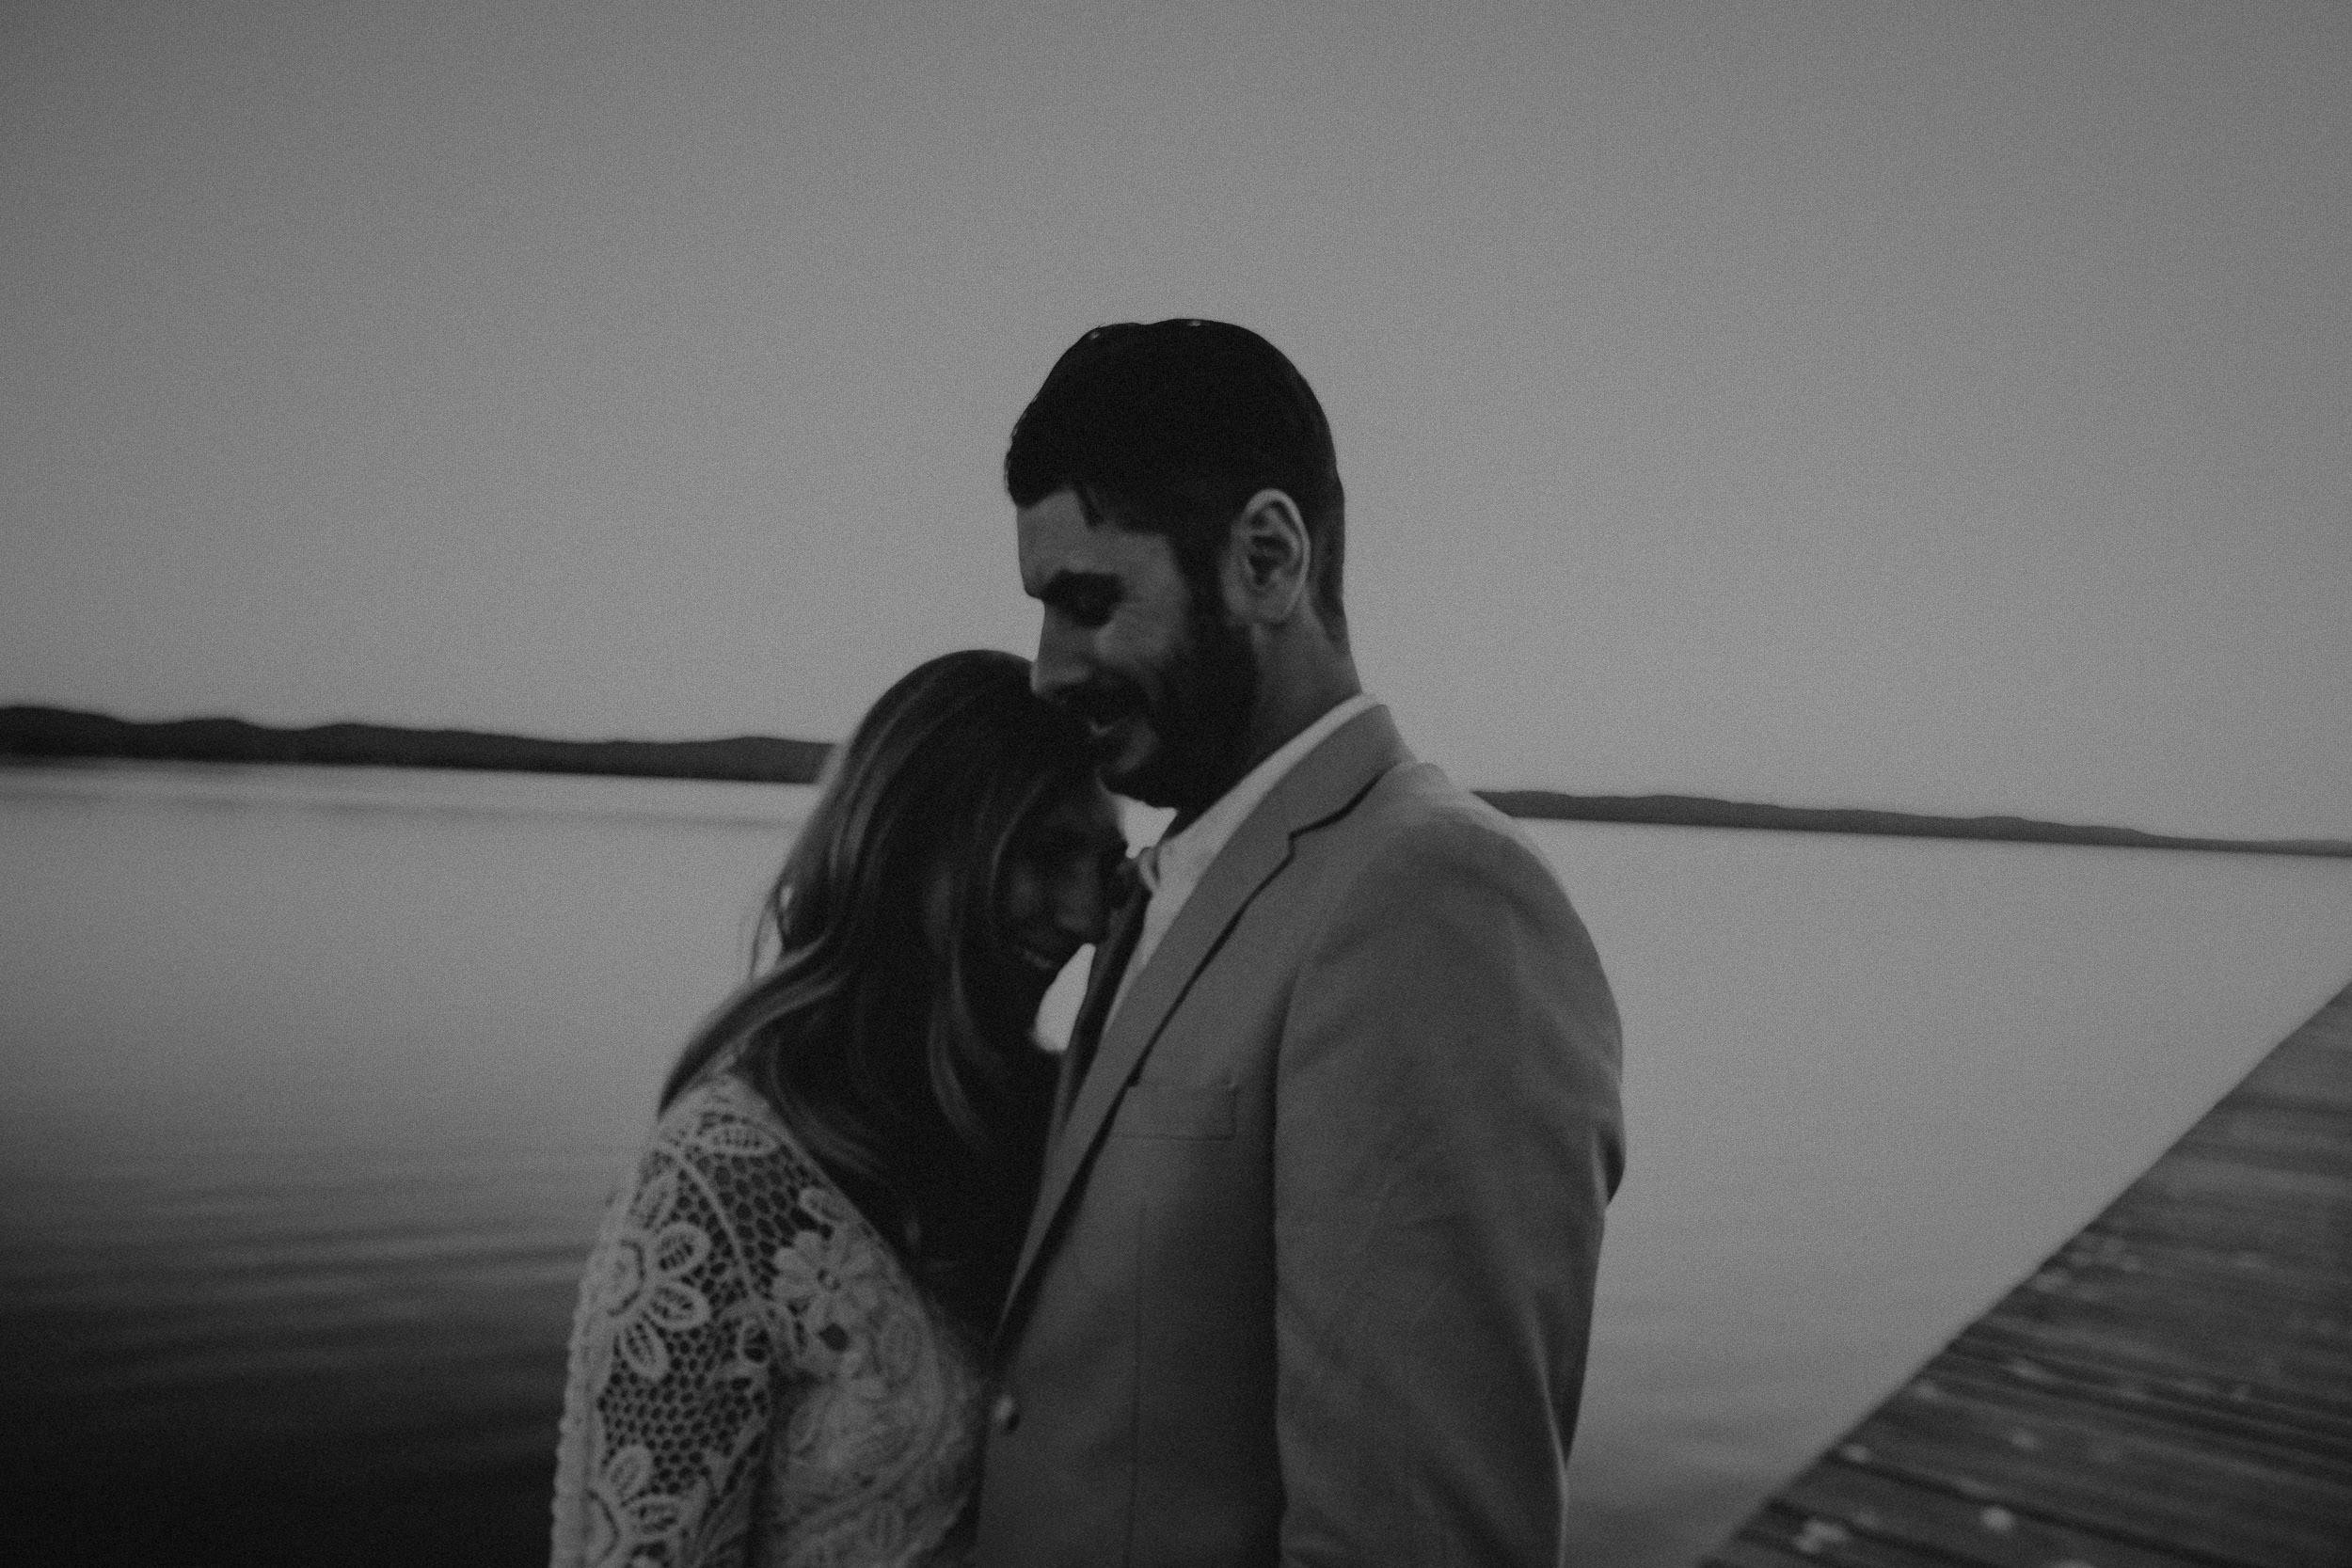 S&A Elopement - Kings & Thieves - Shred 'Til Dead - Central Coast Beach Forest Wedding - 403.jpg